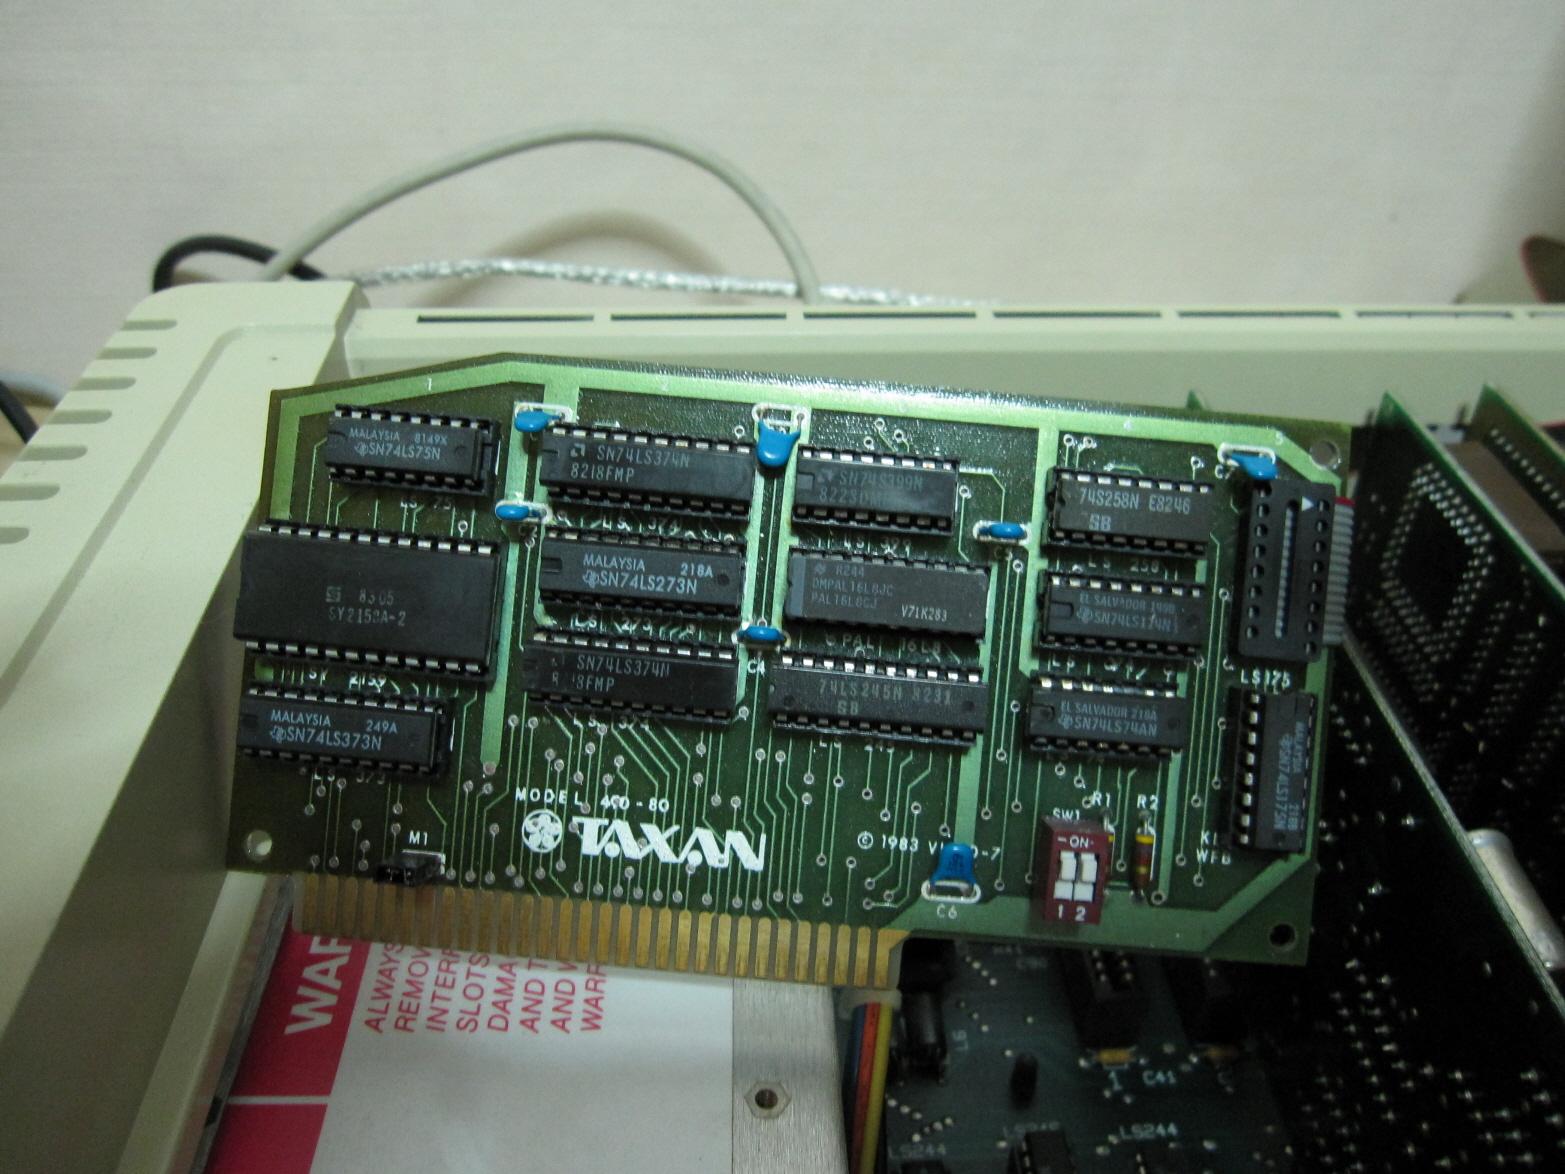 TAXAN 410-80 RGB Card for Apple //e